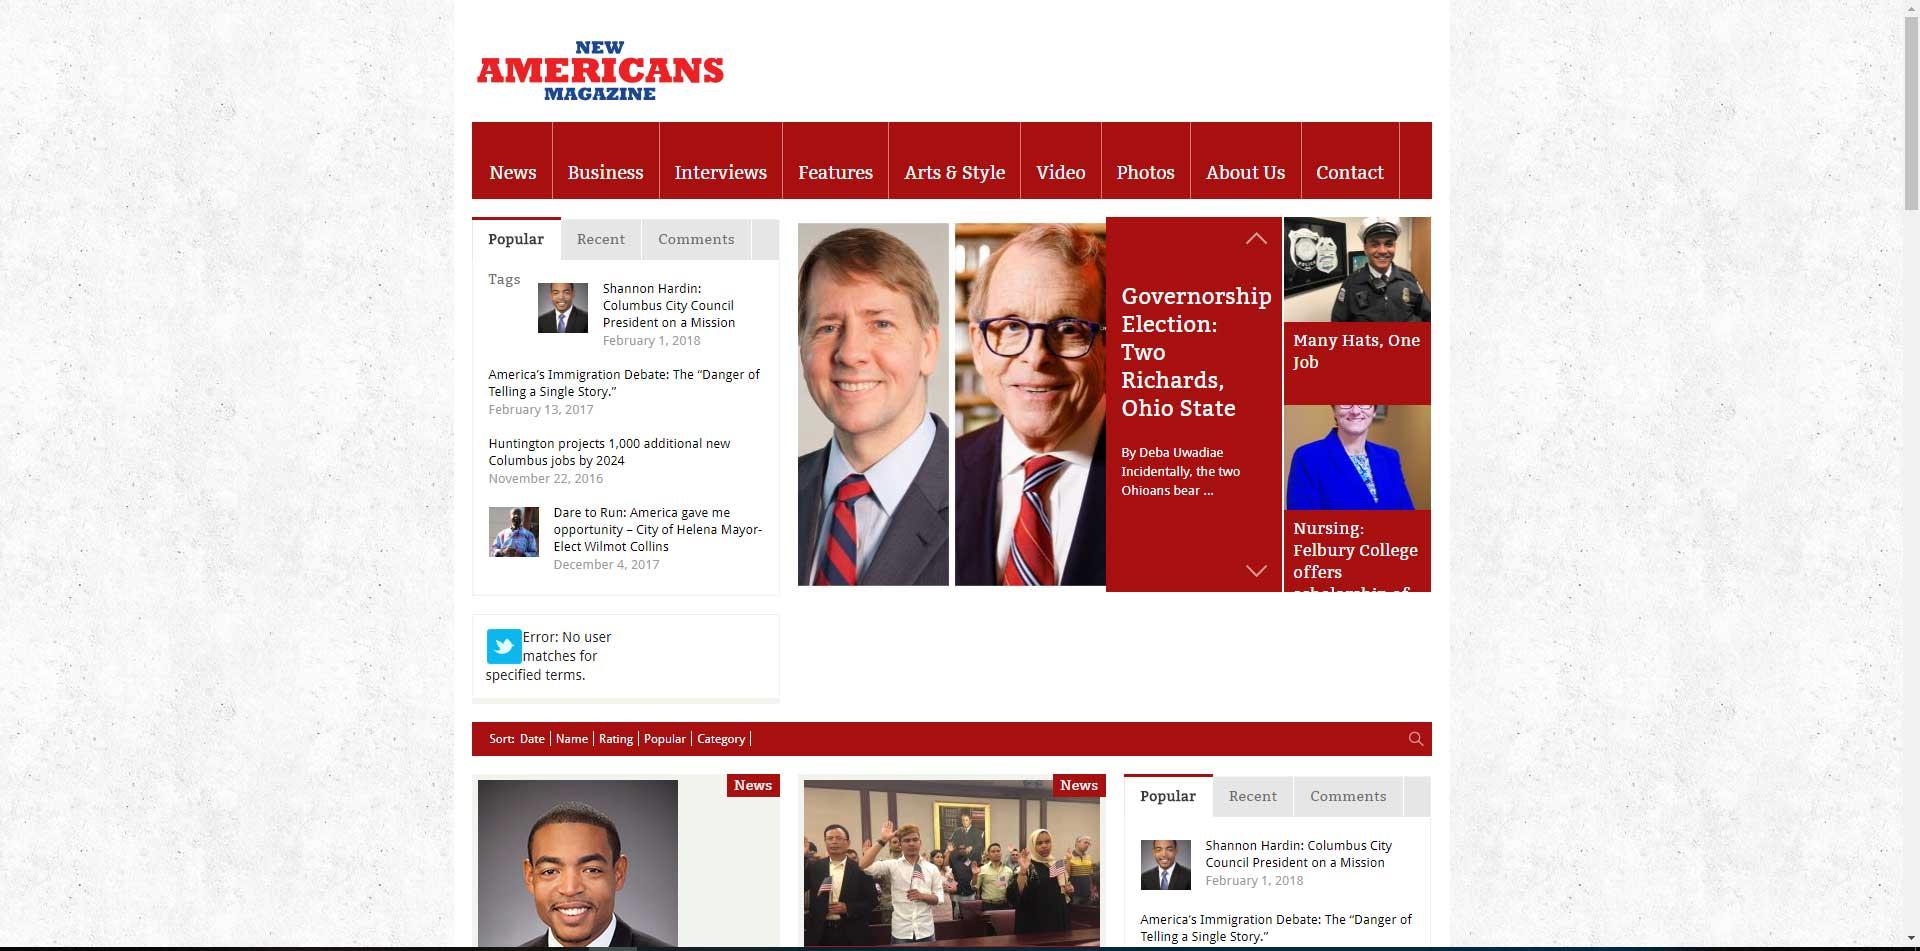 New Americans Magazine website